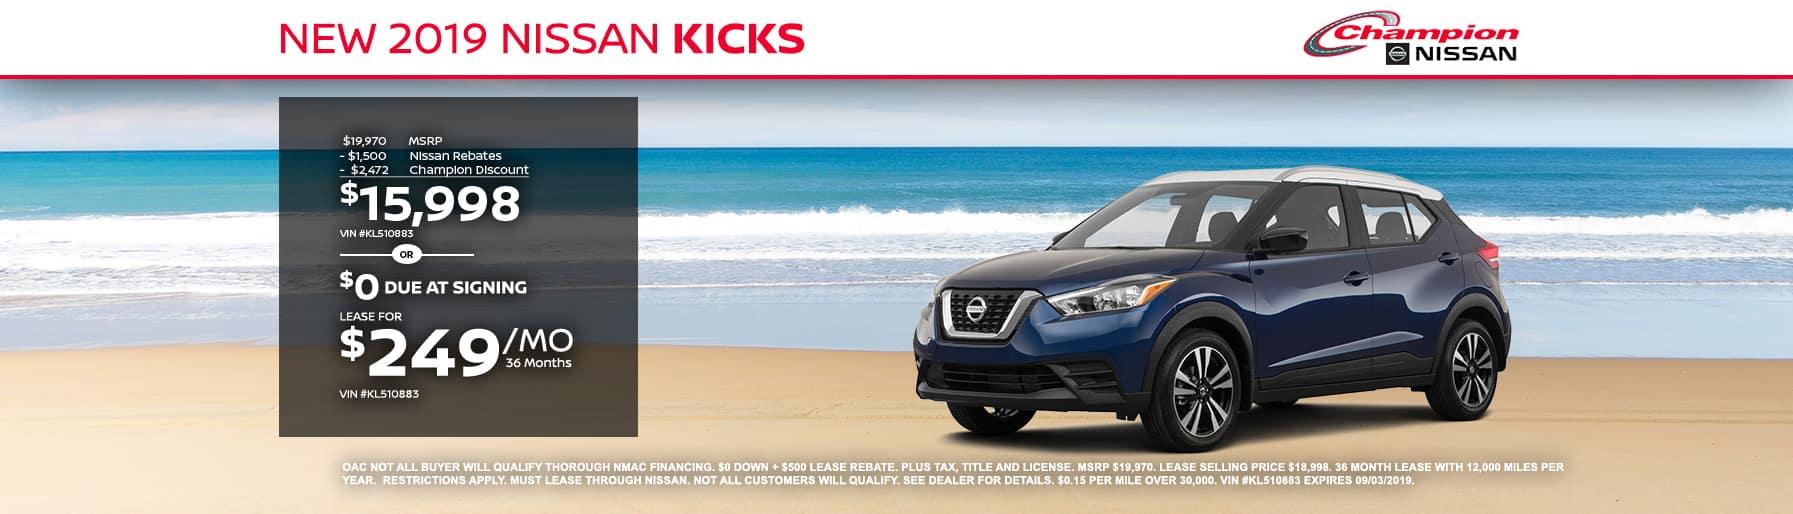 Nissan Dealership Los Angeles >> Nissan Dealership New Used Cars Trucks Suvs For Sale Near Me